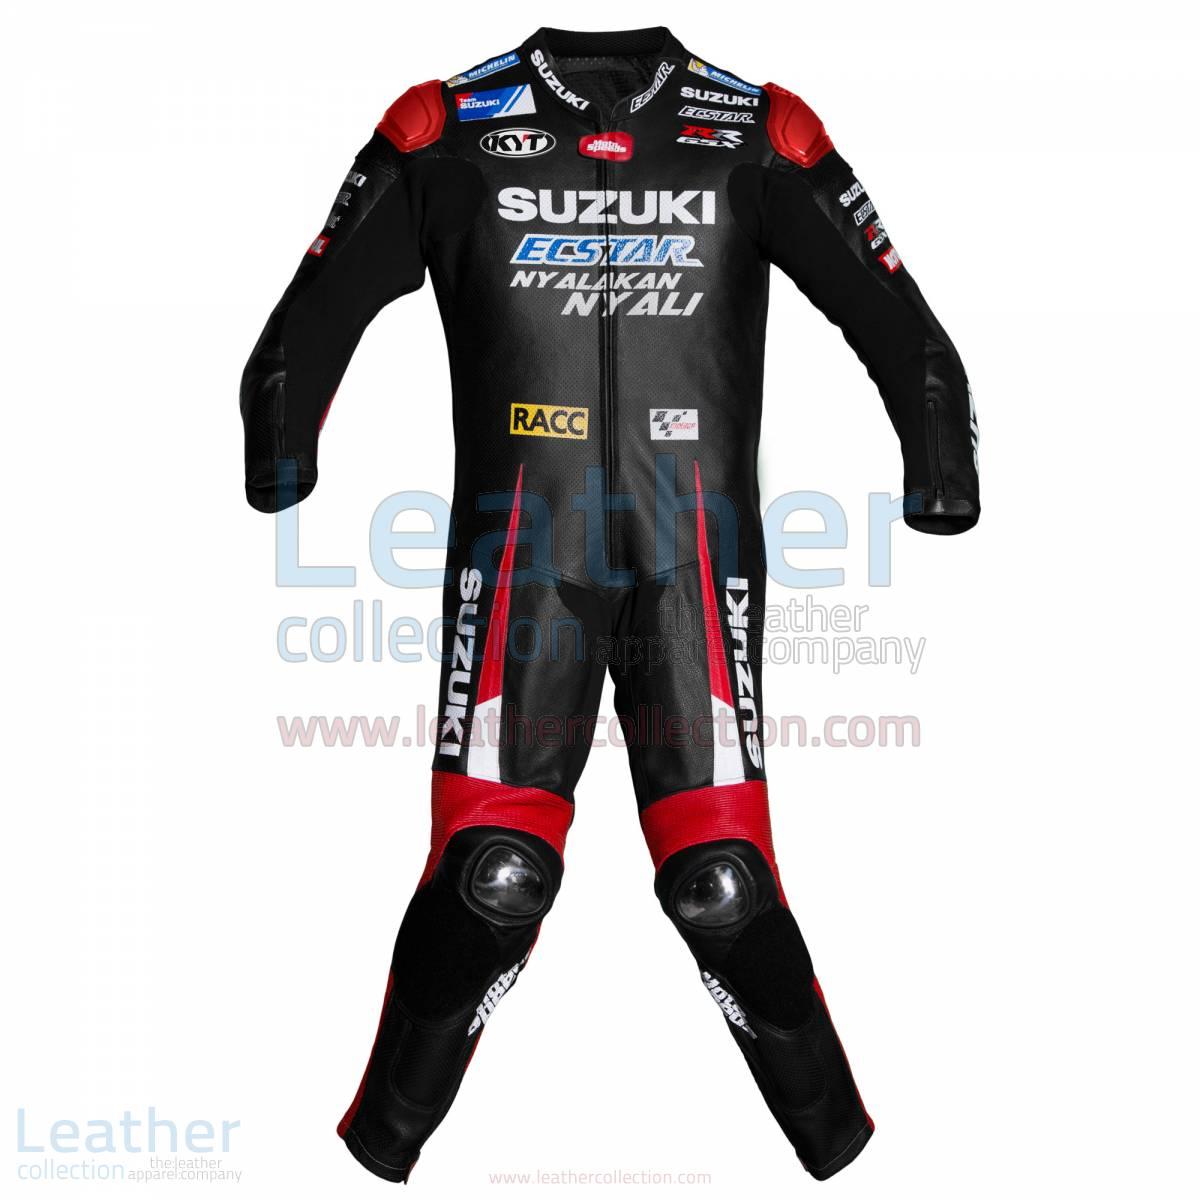 Suzuki Leather Suit